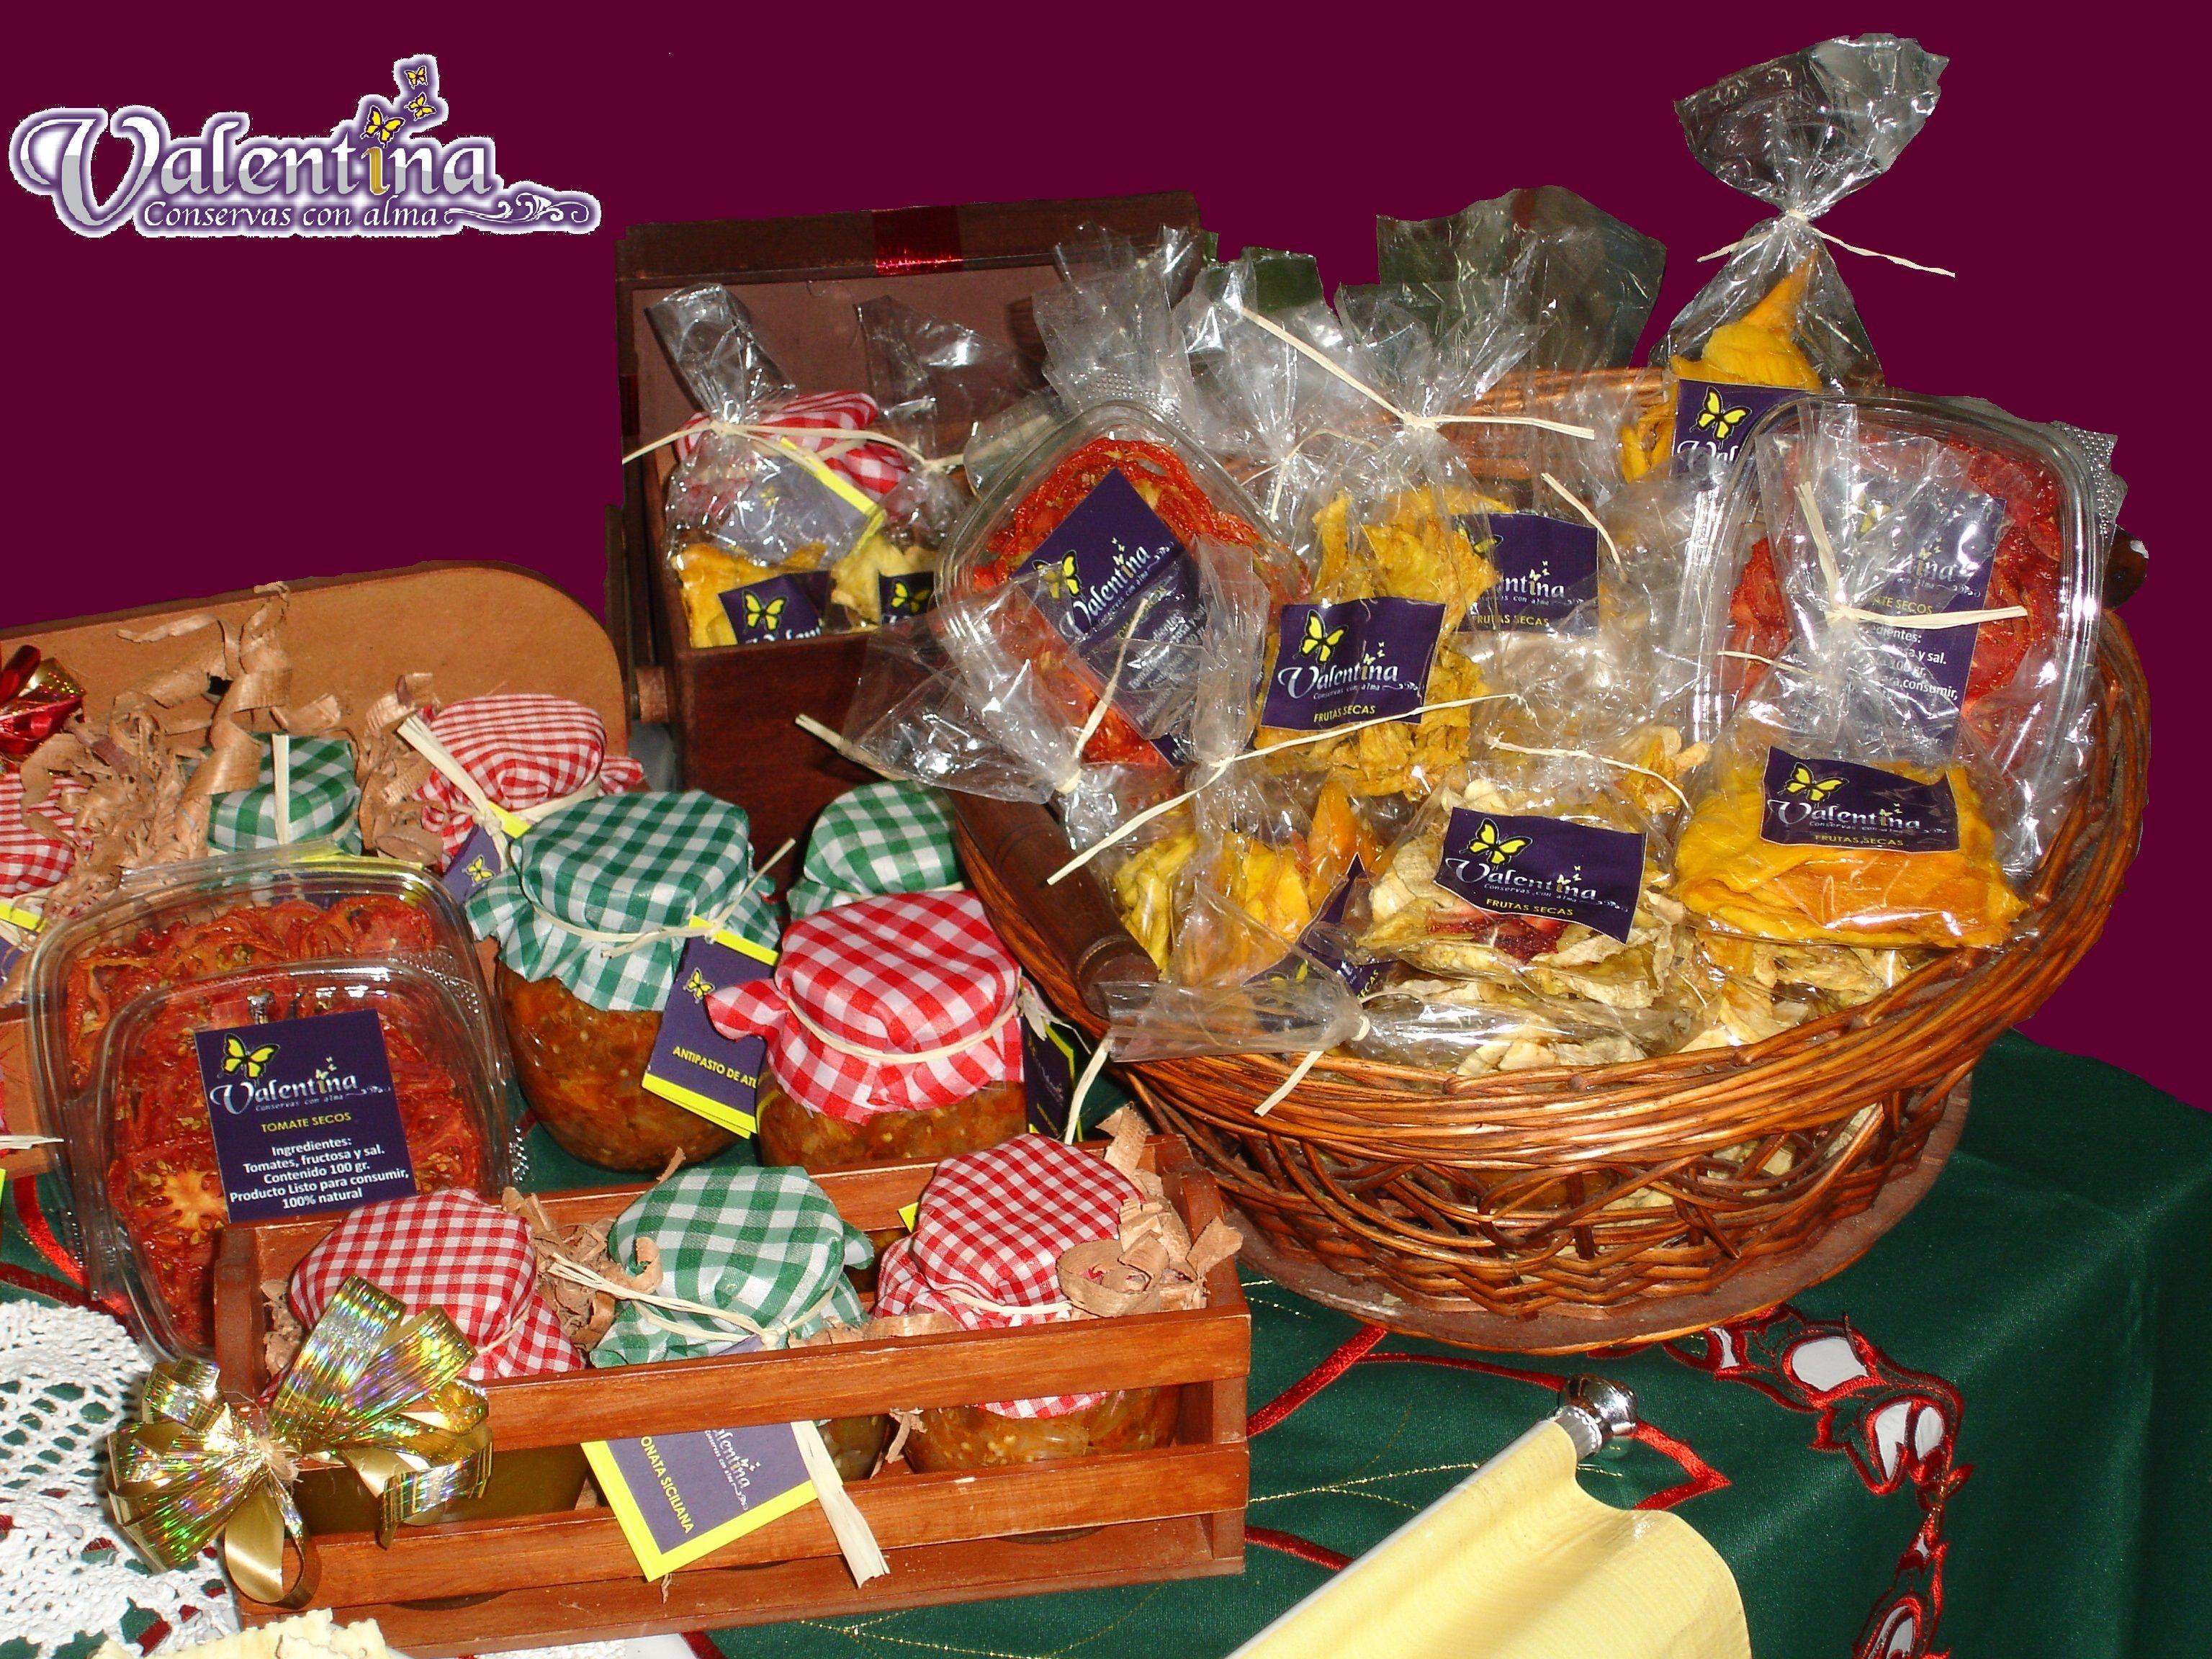 Detalles para navidad valentina gourmet manualidades for Detalles de navidad